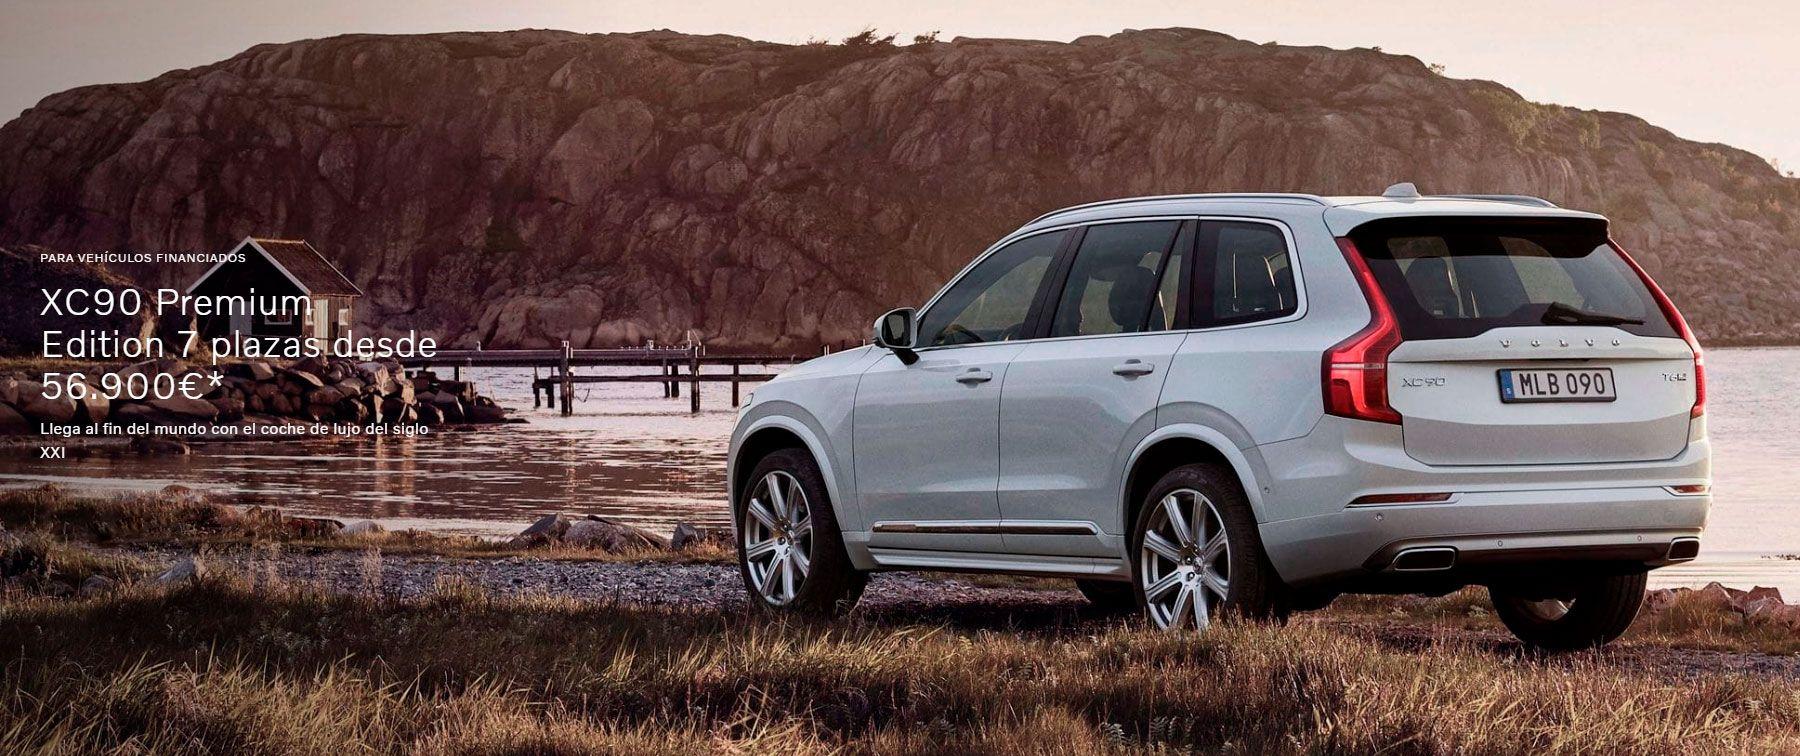 XC90 B5 AWD Premium Edition automático 7 plazas desde 56.900€